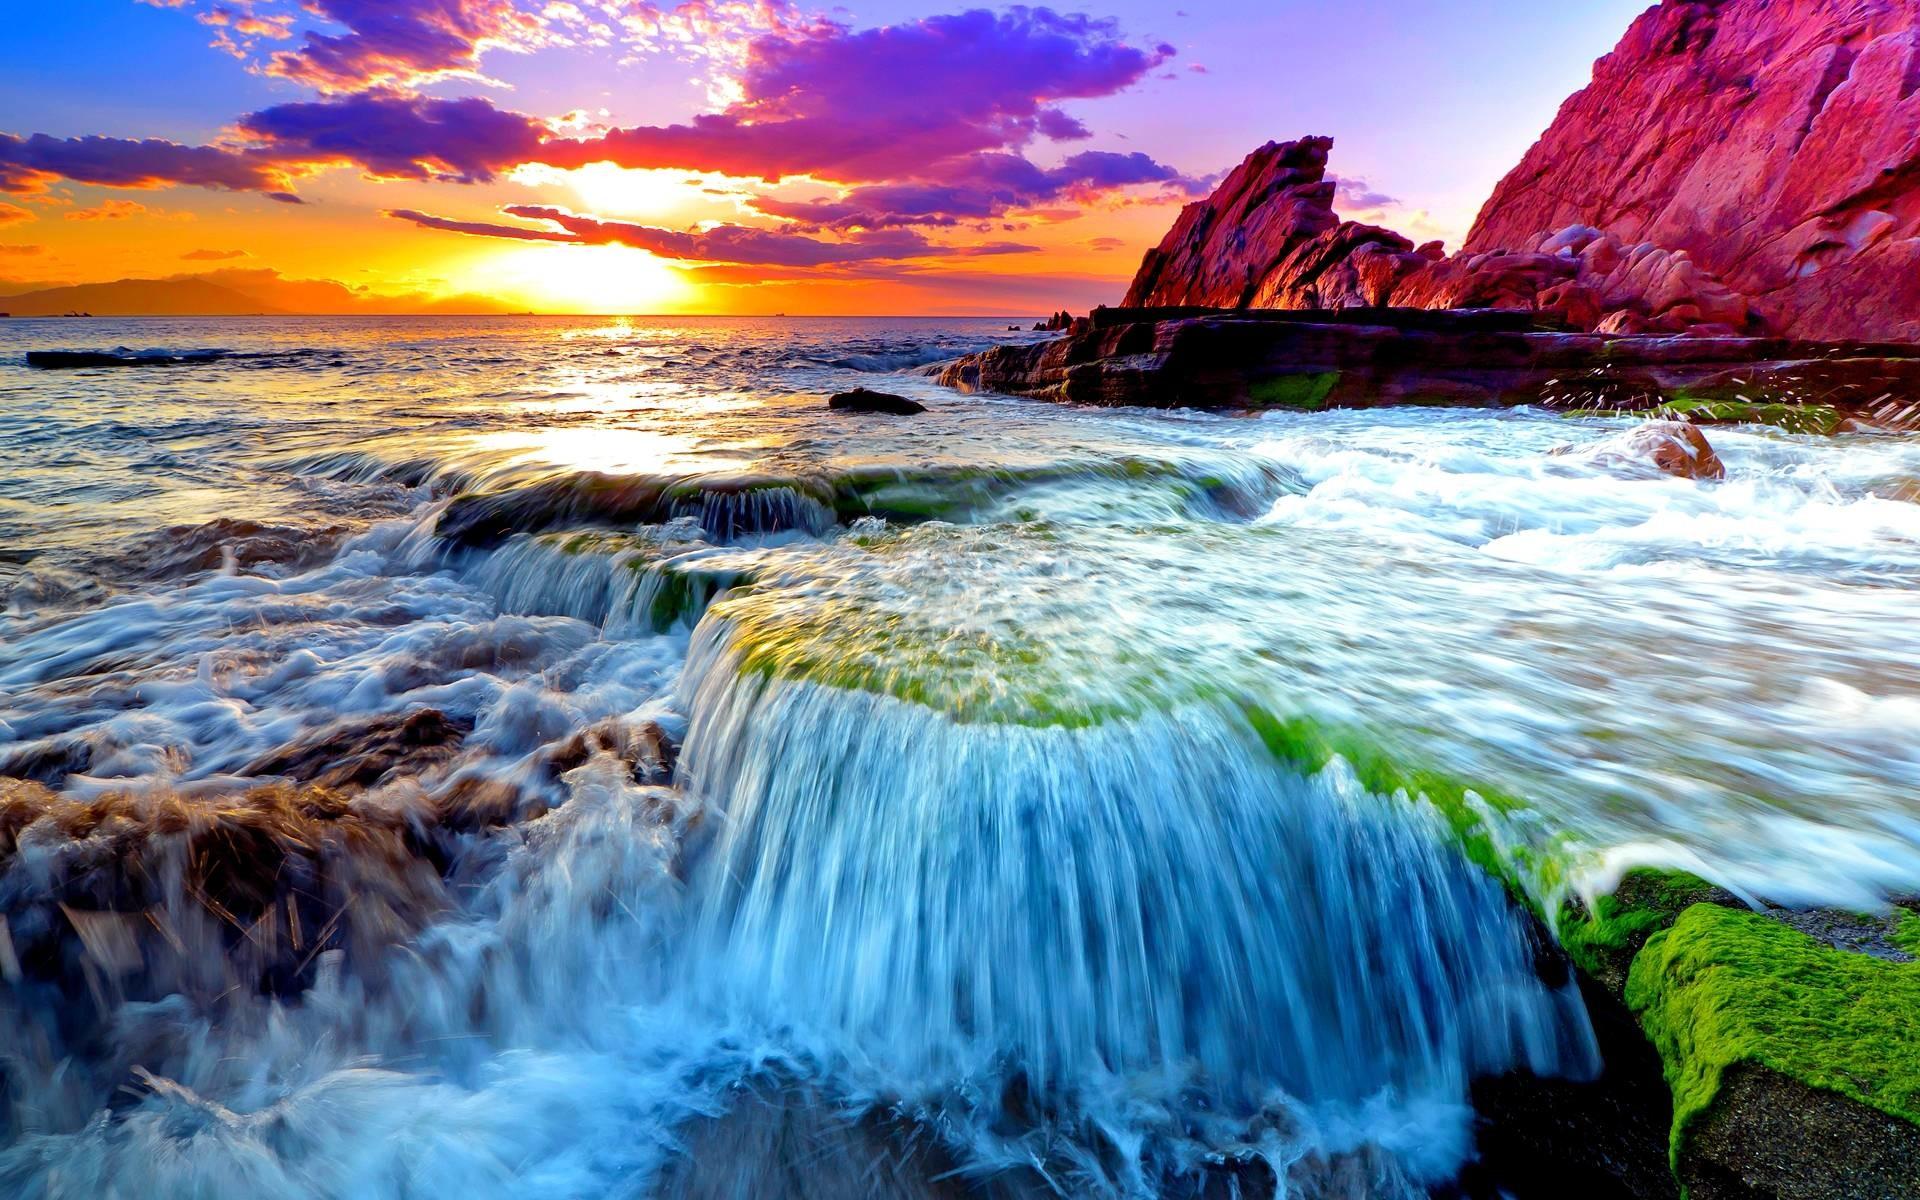 Nature Scene Waterfall Hd Wallpapers One plus